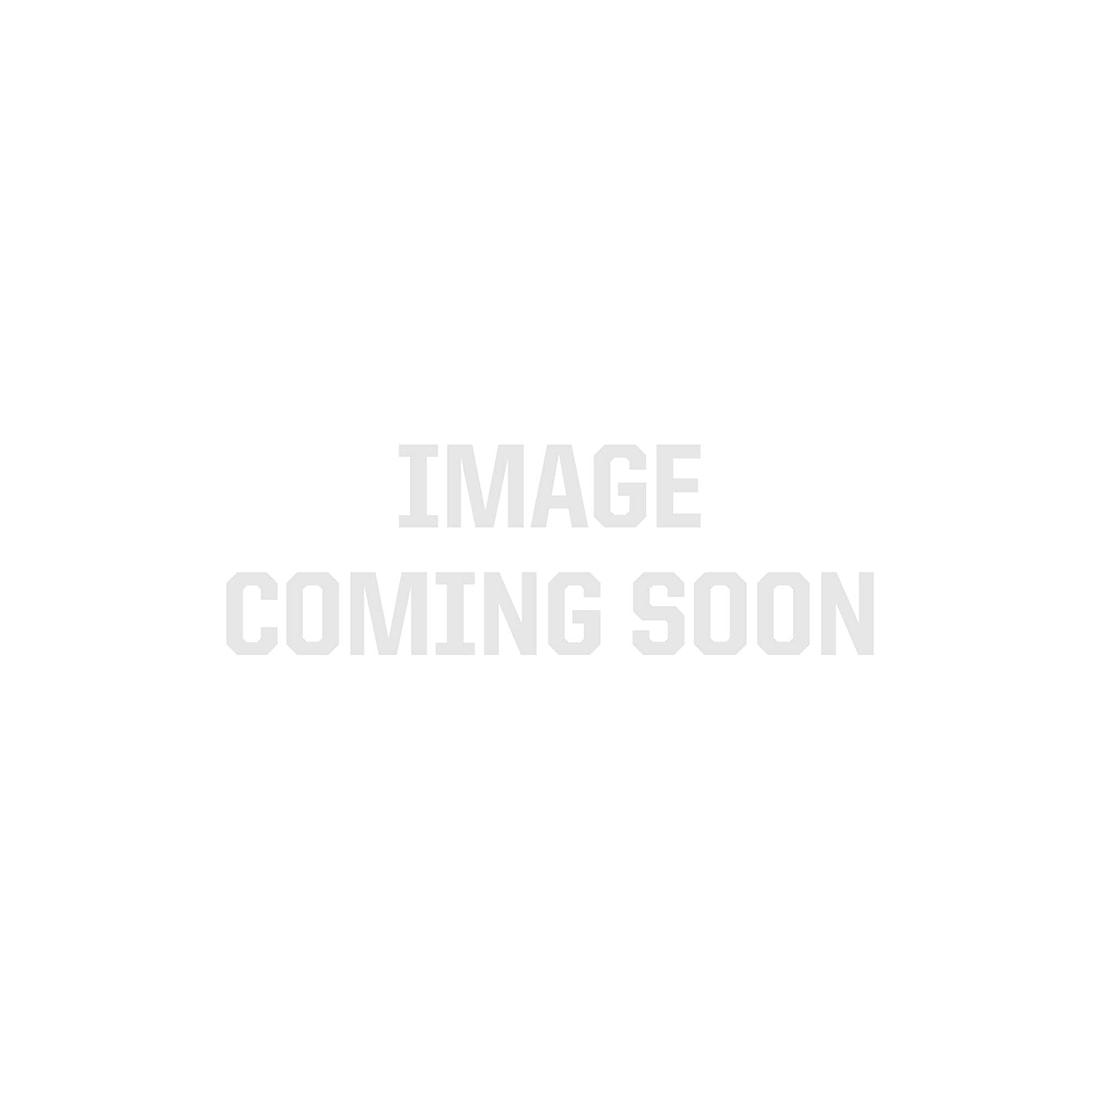 G50mm Clear Glass Dimmable LED Light Bulb, E26 (Medium) Base, 1.4 watt (Warm White)